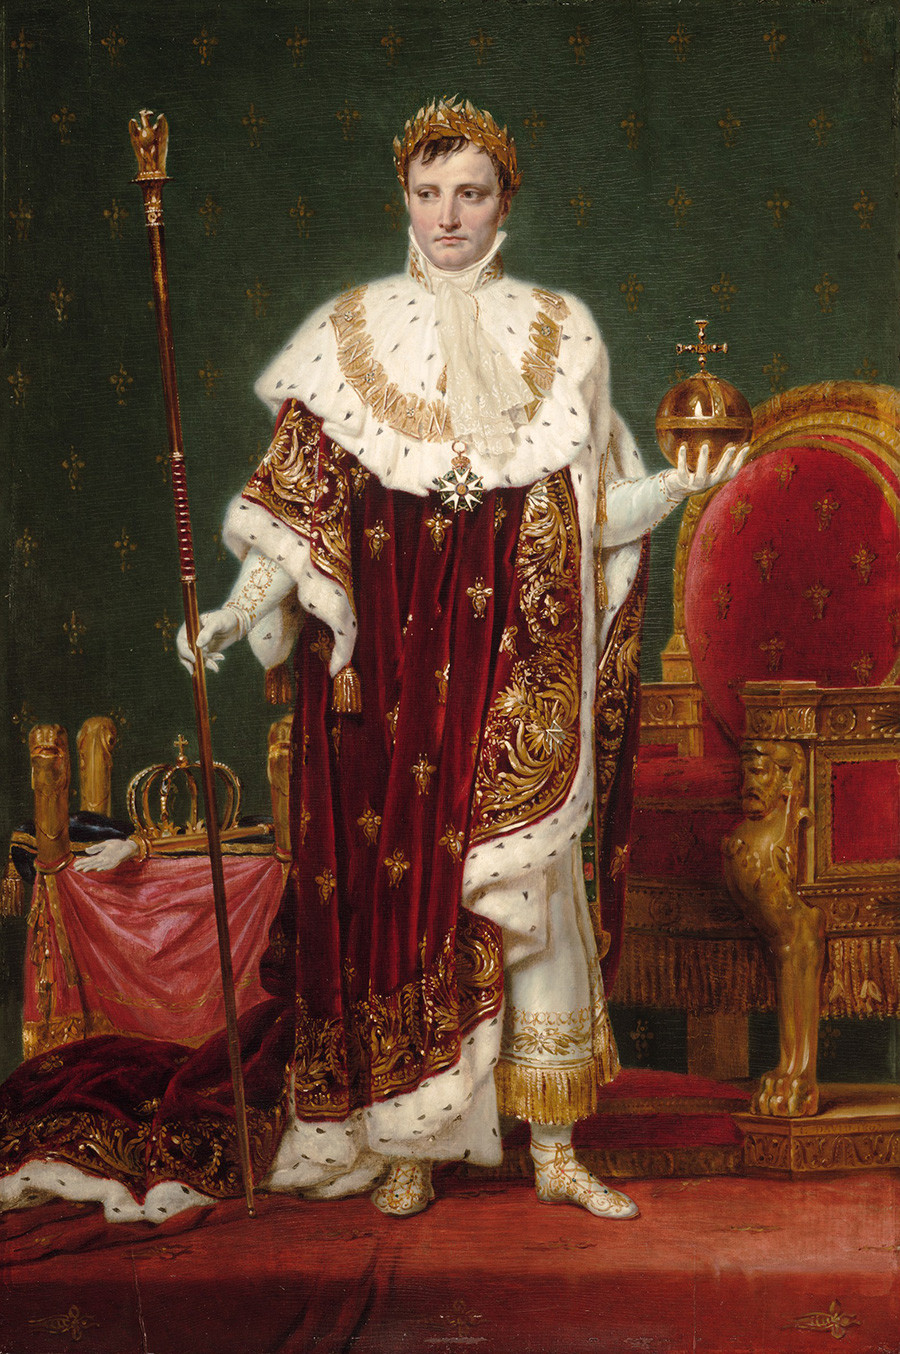 Kaisar Napoleon I (1769 – 1821) oleh Jacques-Louis David, 1807